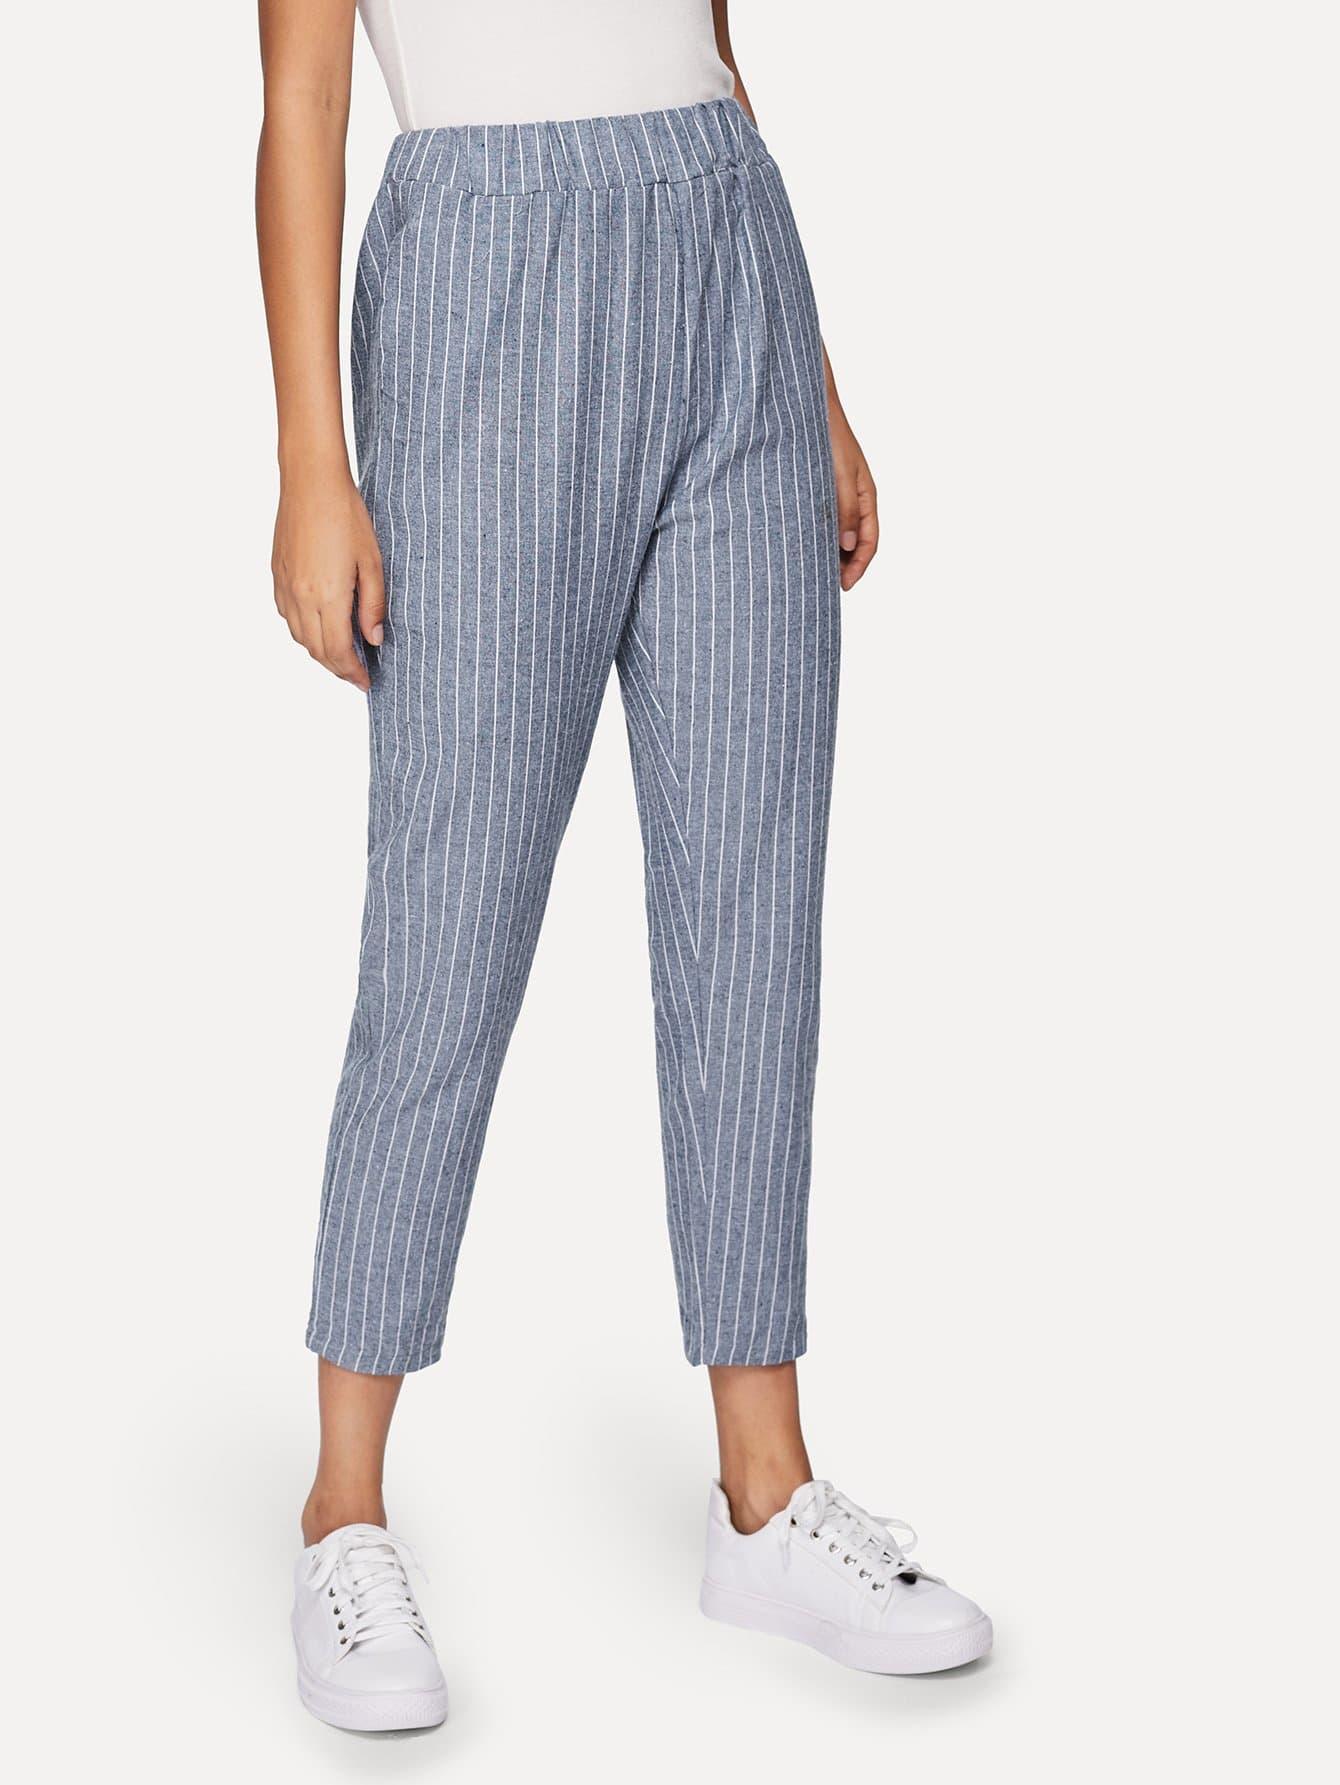 Pinstriped Elastic Waist Pants